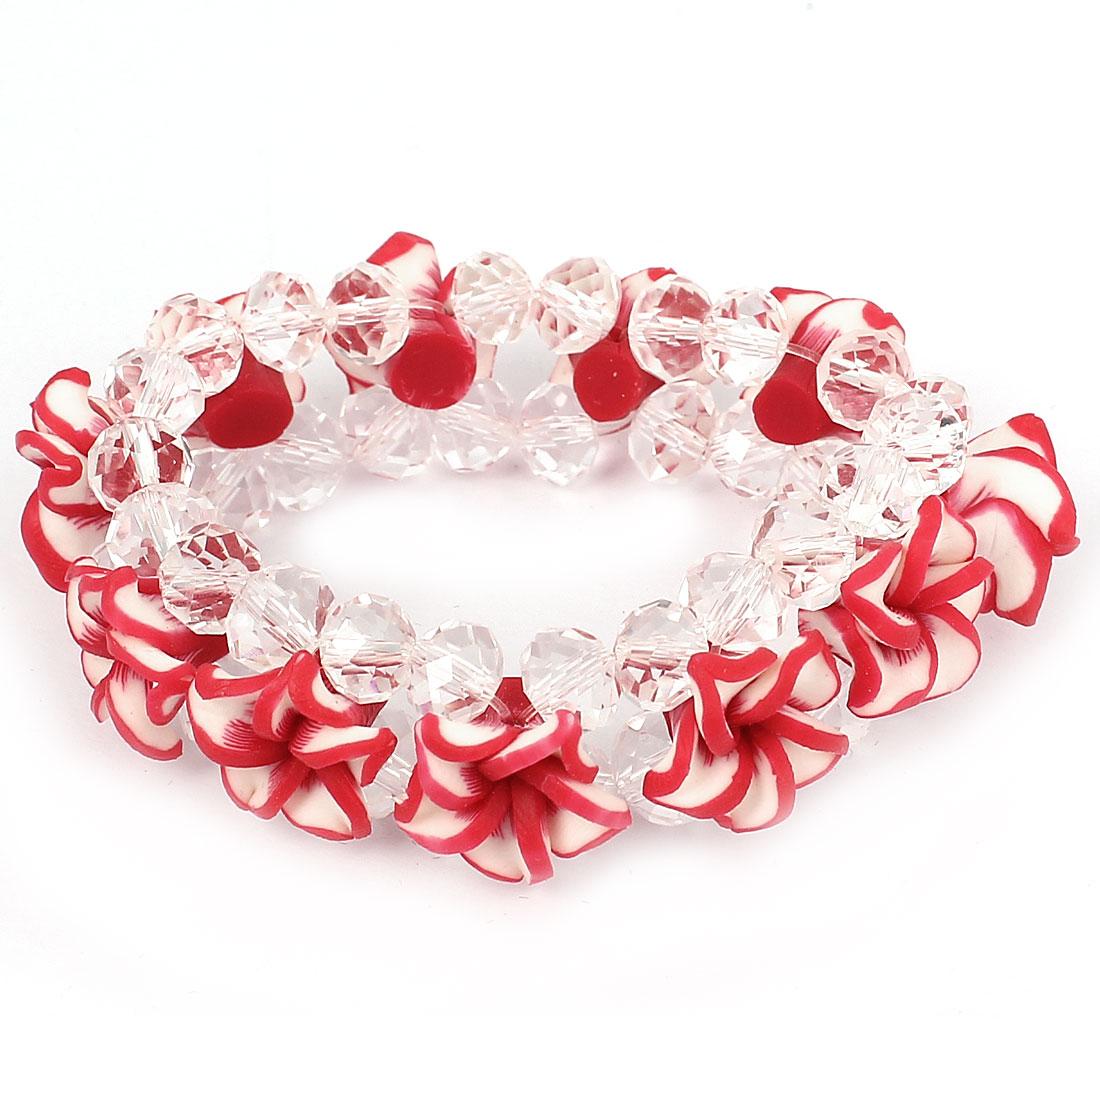 Lady Peony Flower Faux Crystal Inlaid Wrist Chain Bangle Bracelet Decor Red